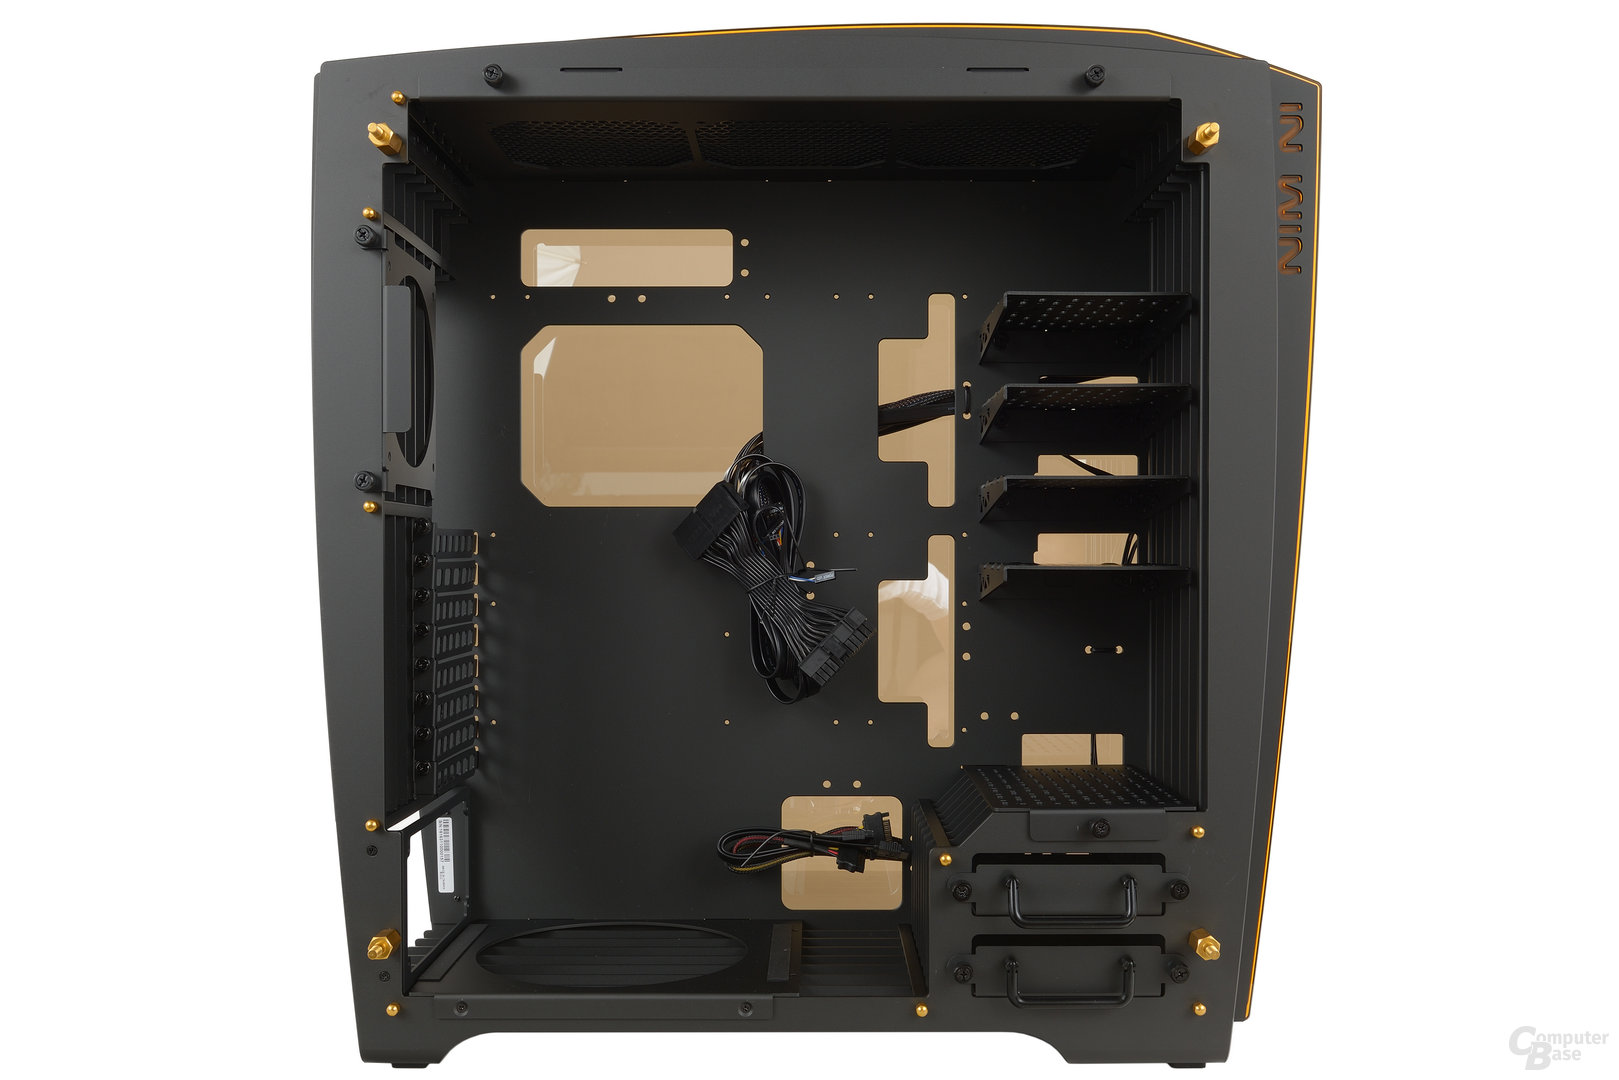 In Win H-Frame 2.0 – Innenraumansicht